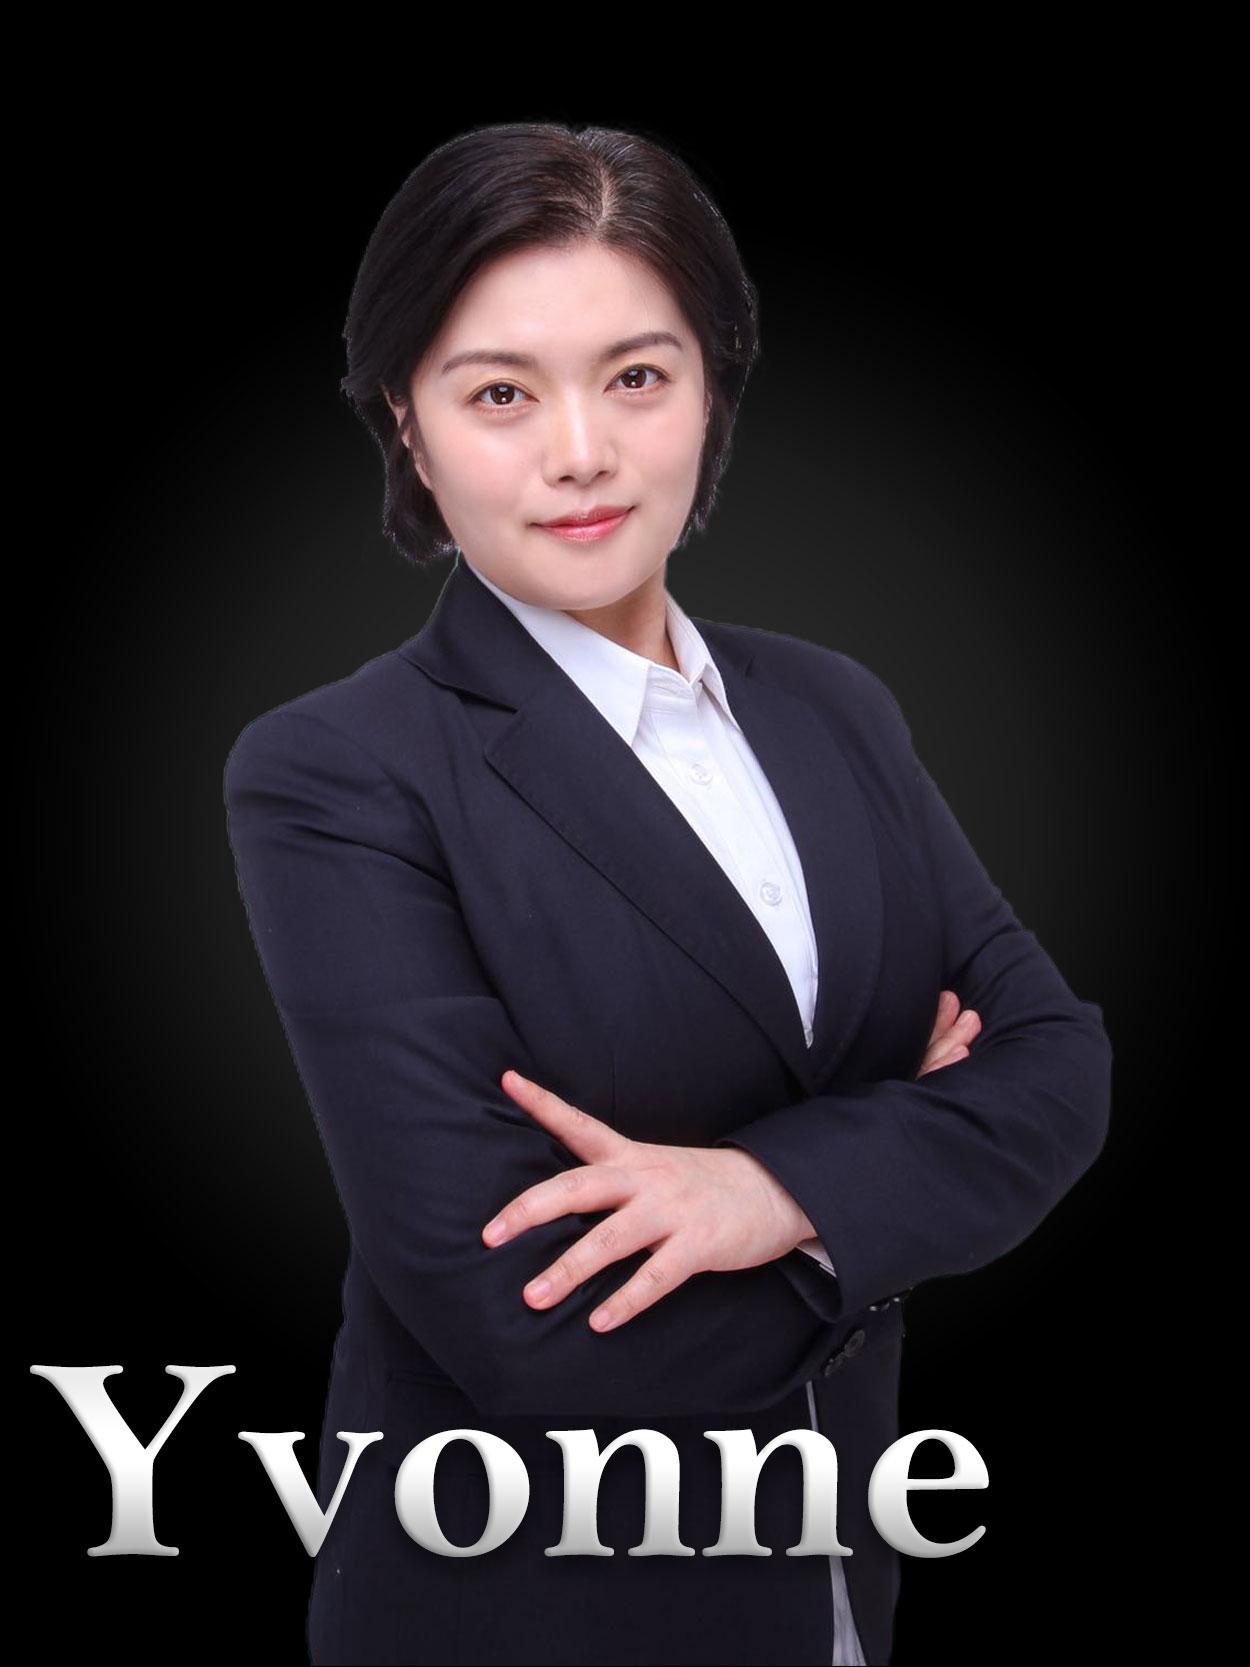 Yvonne3